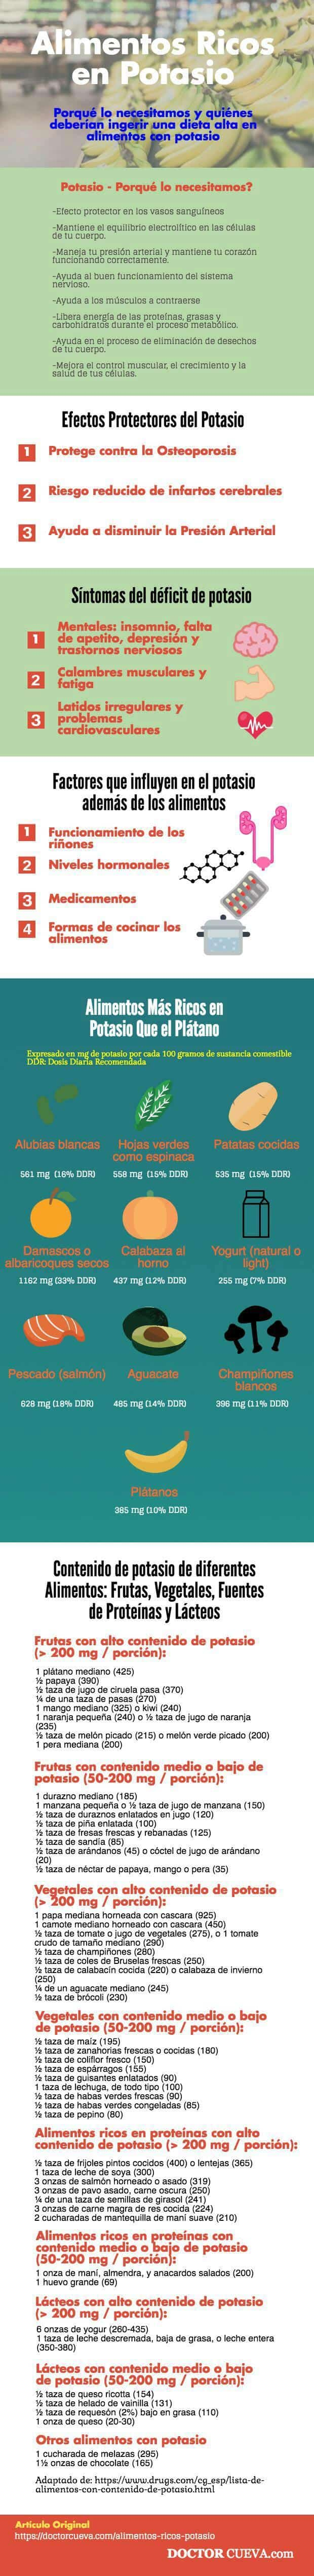 alimentos ricos en potasio infografia